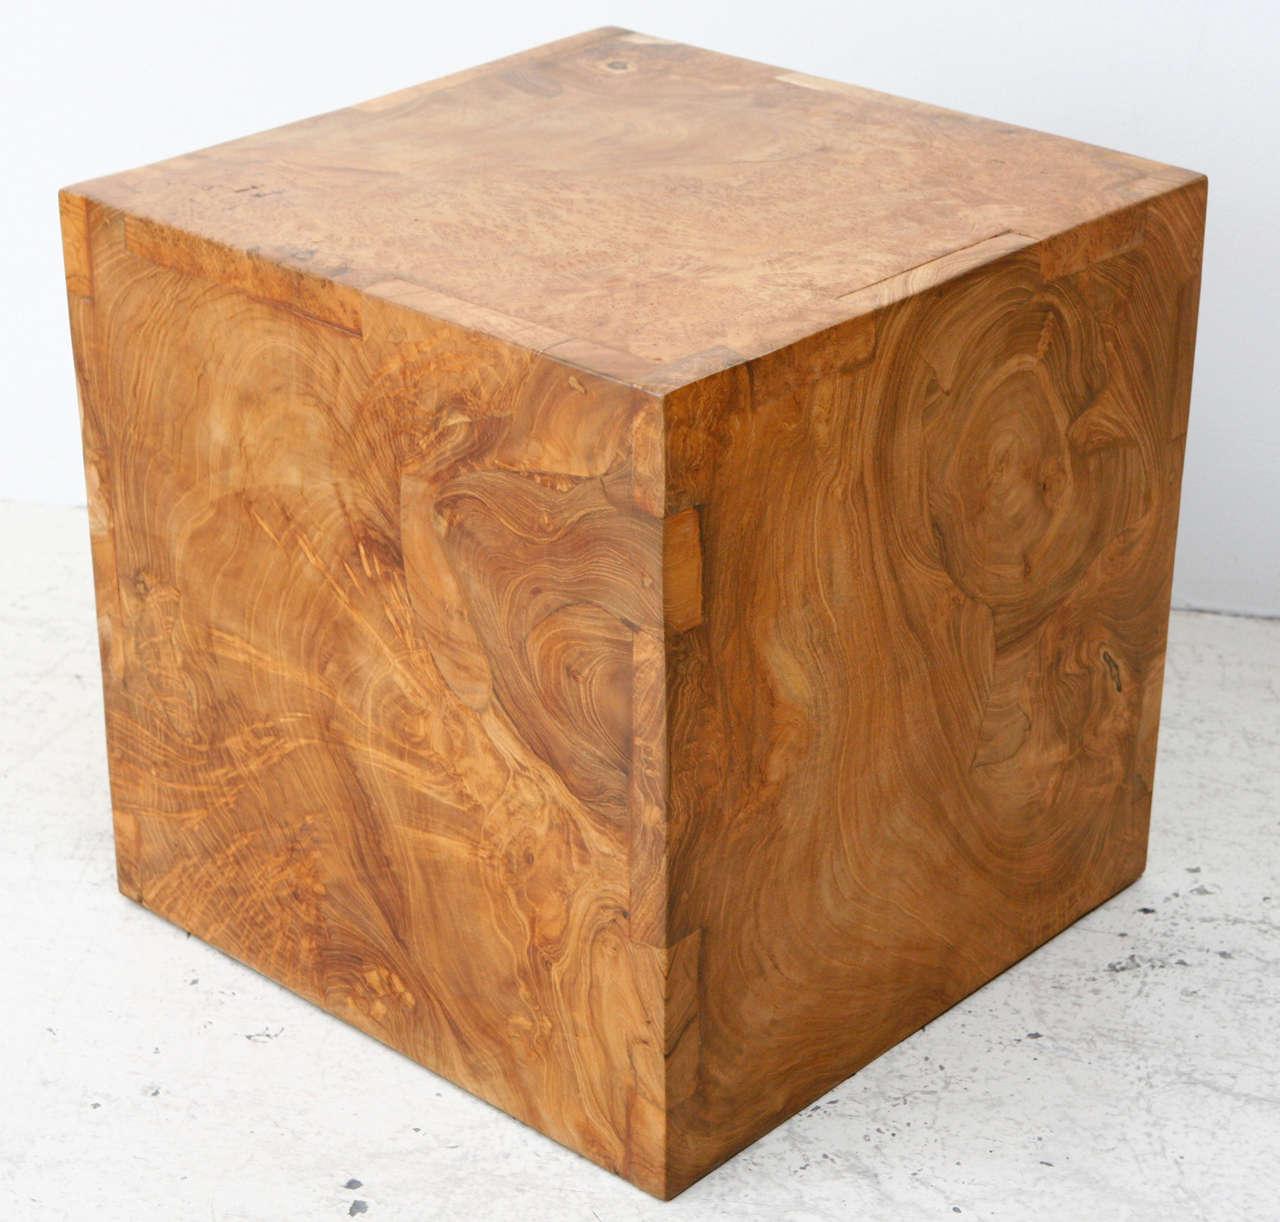 Vintage Solid Burl Wood Cube Image 3